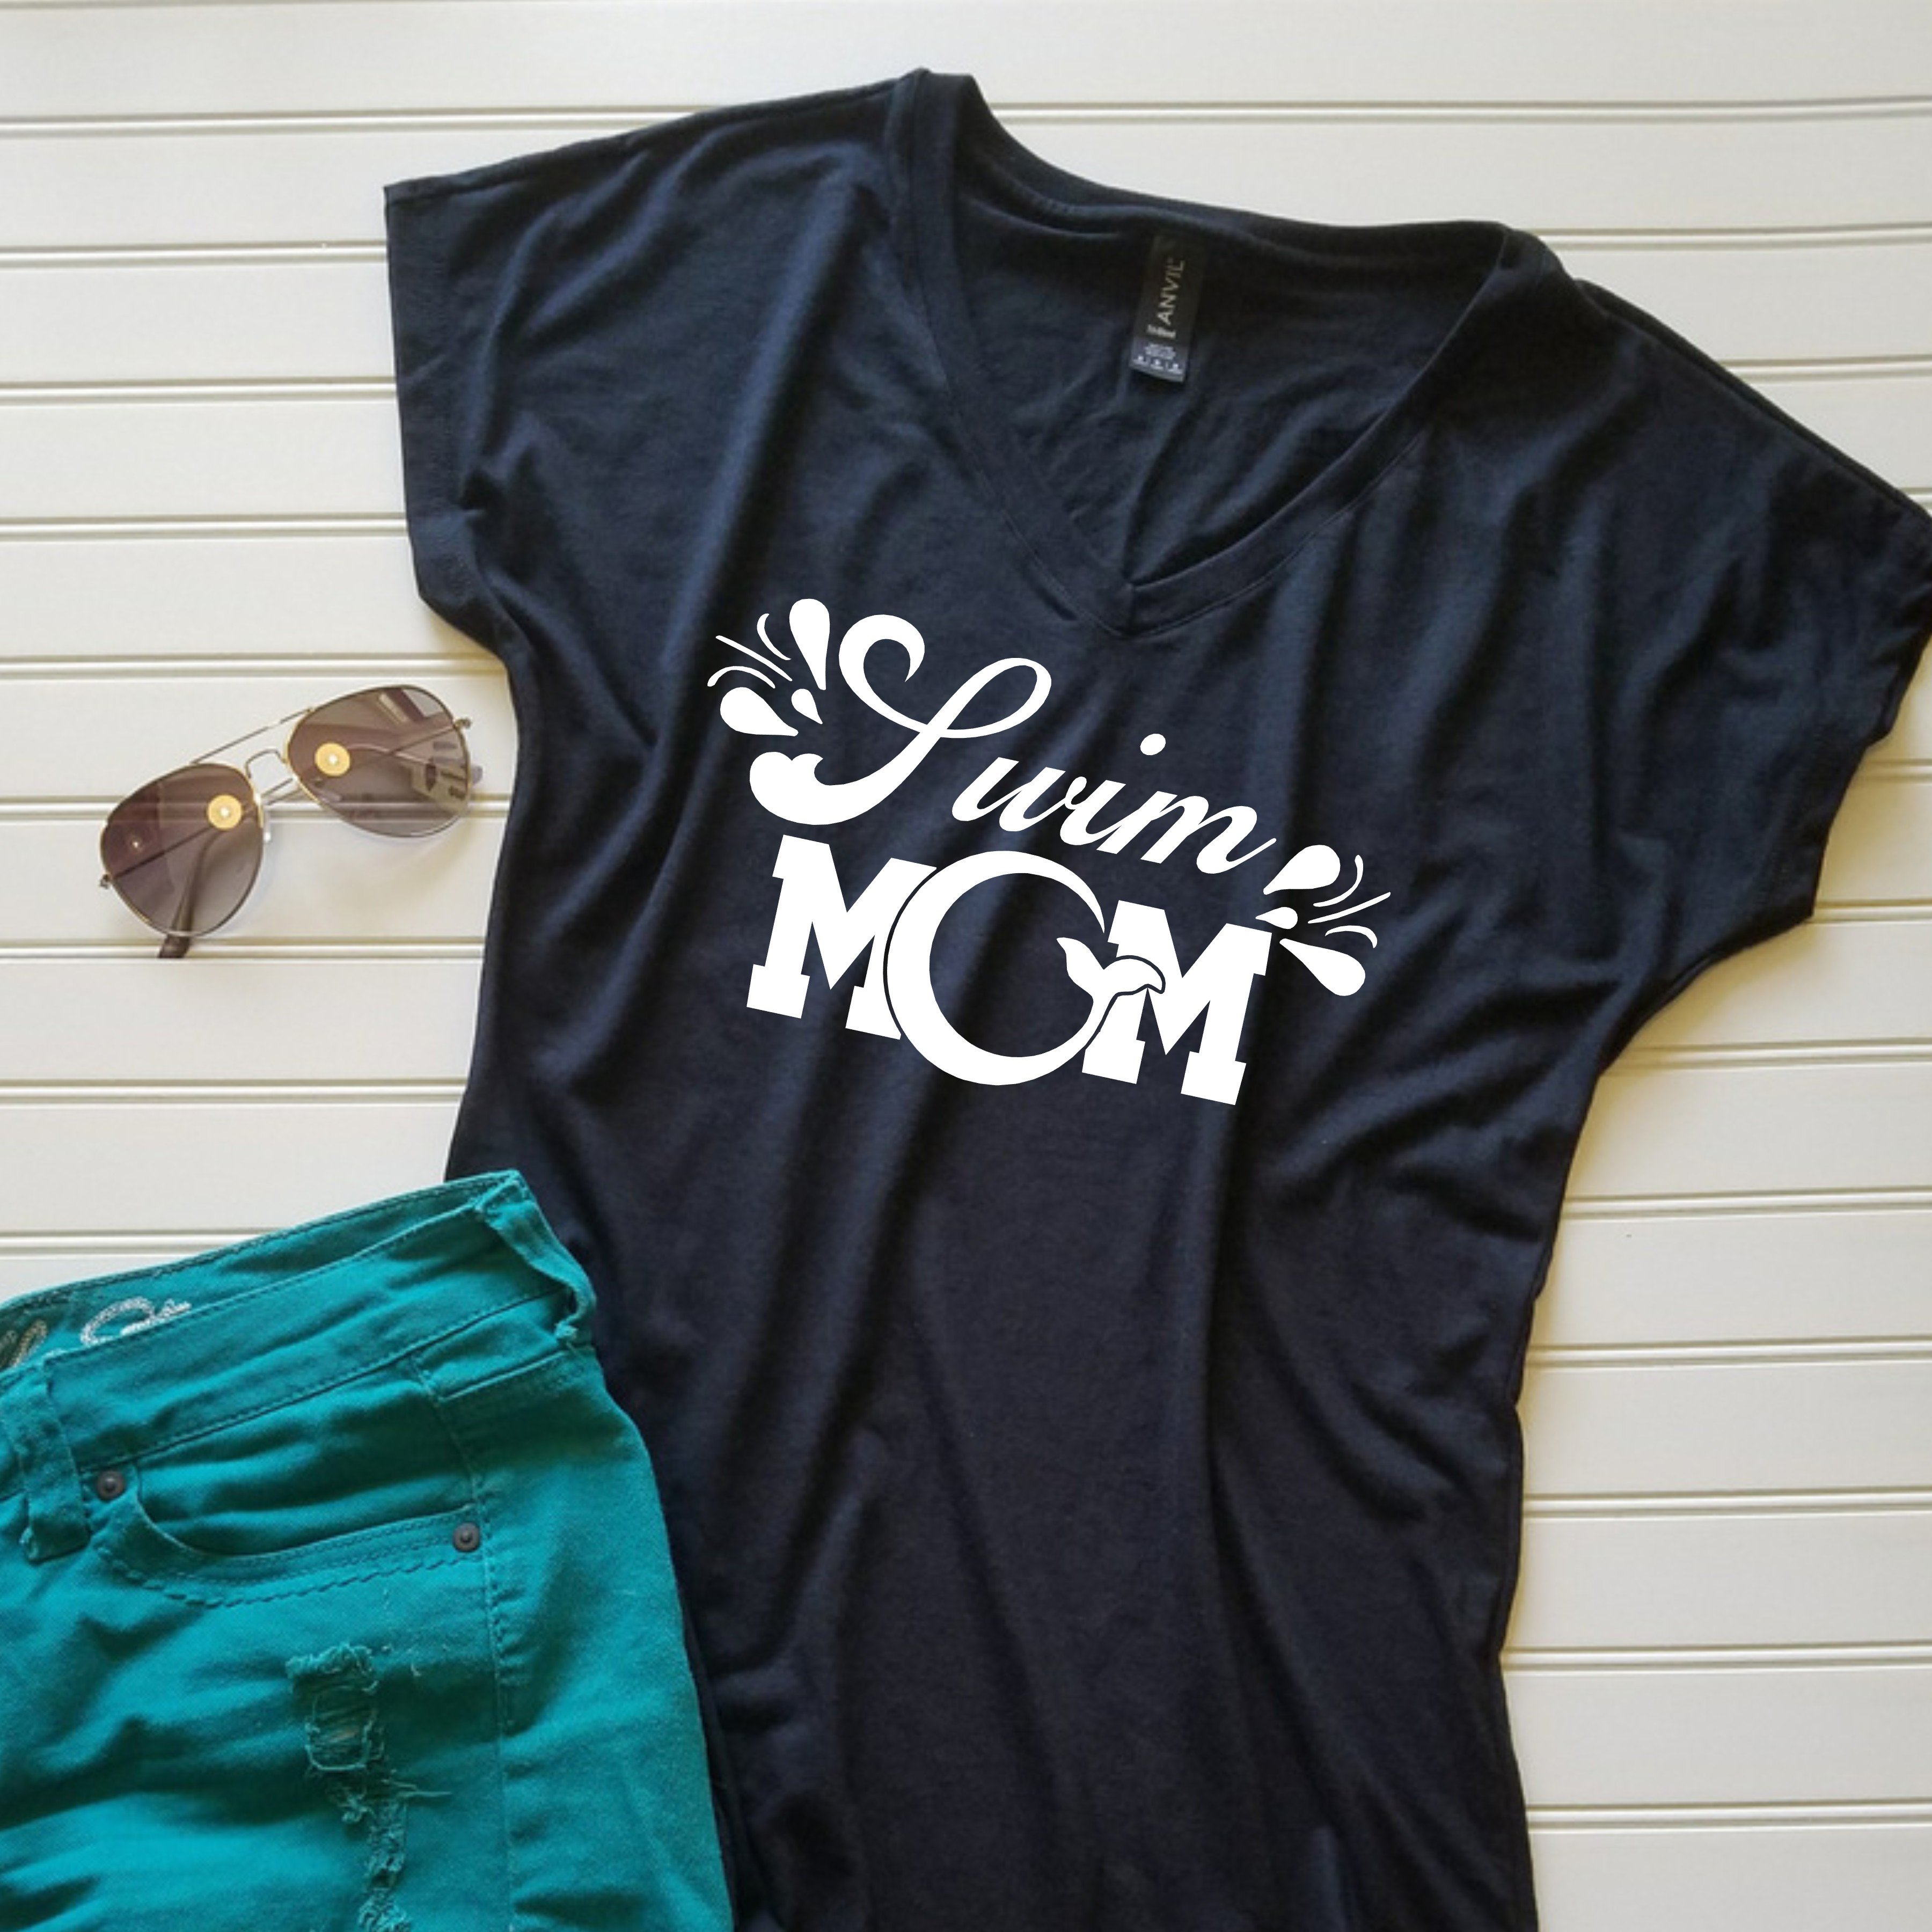 Details About Swim Mom Shirt Mom Tshirt Gift For Her Gift For Mom Custom Tshirt